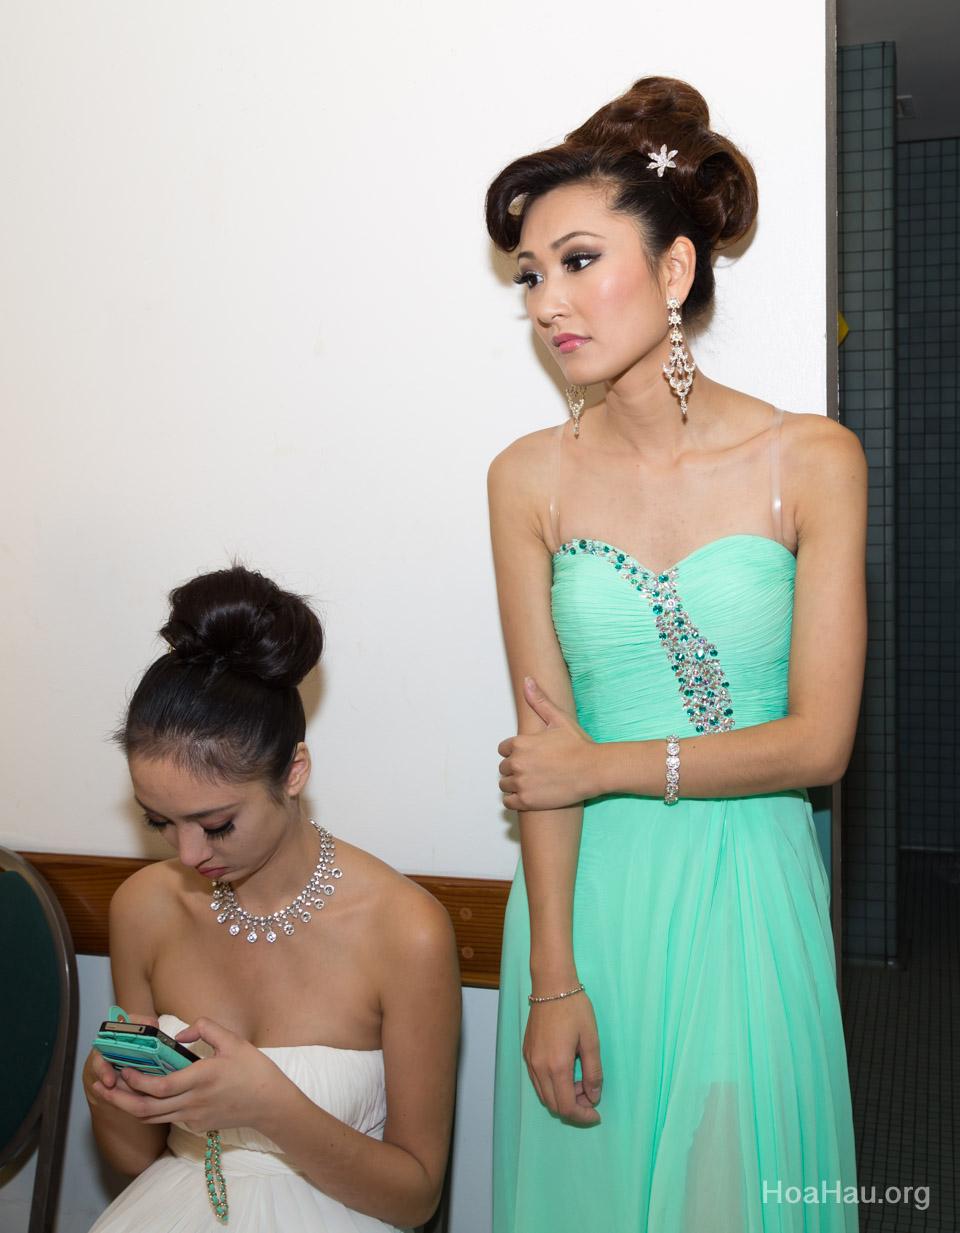 tram nho ngan thuong 2013 - Image 157